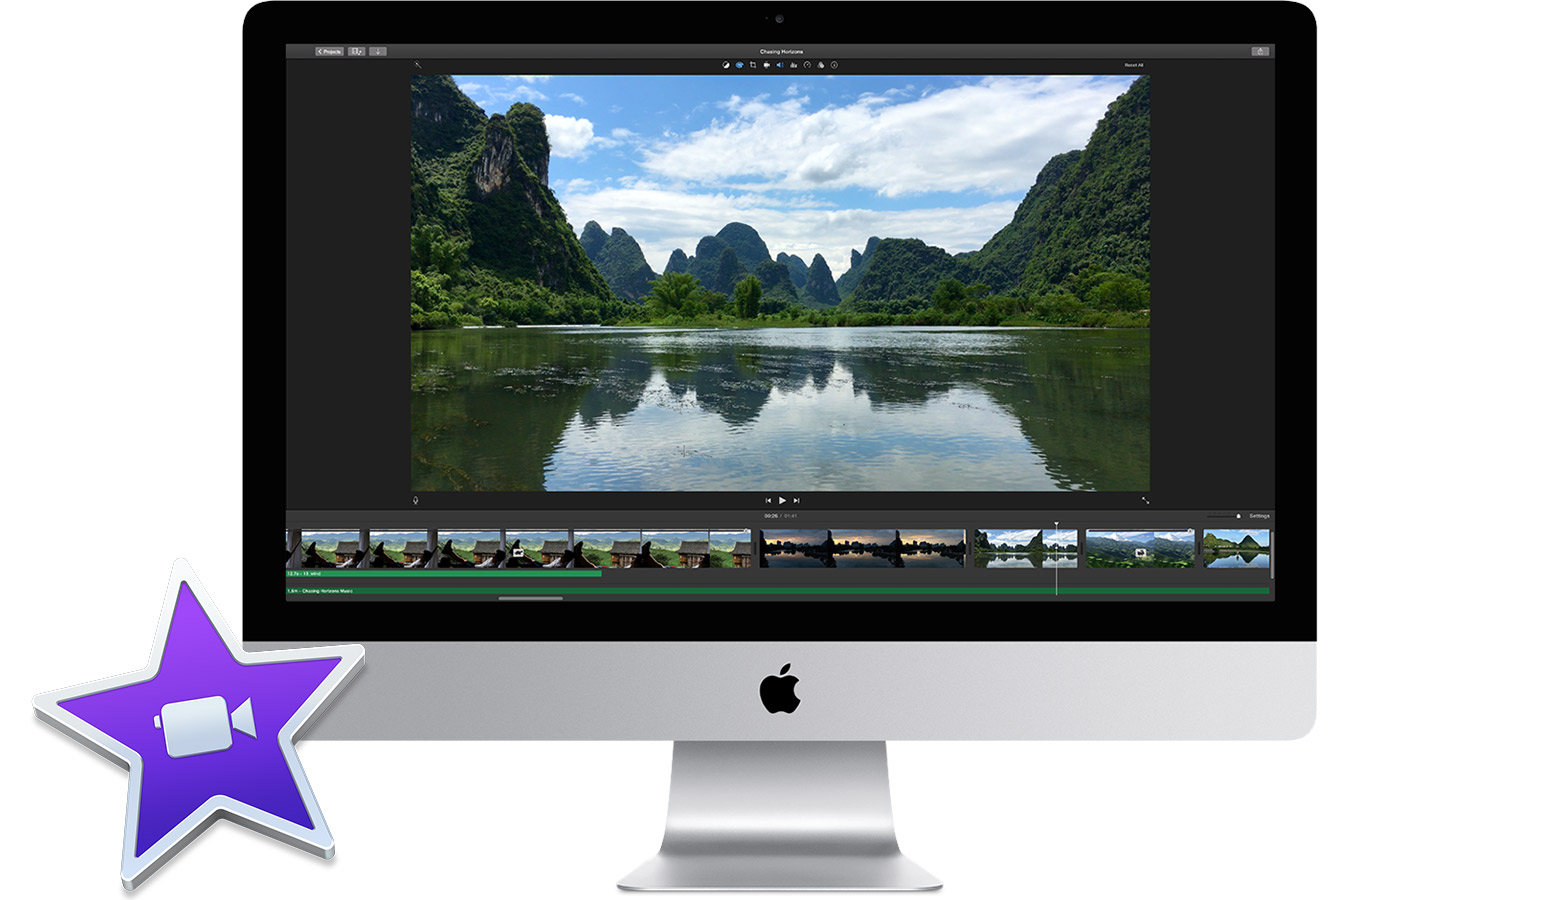 Apple iMovie 10.1.6 دانلود نرم افزار ویرایش حرفه ای فیلم برای مک